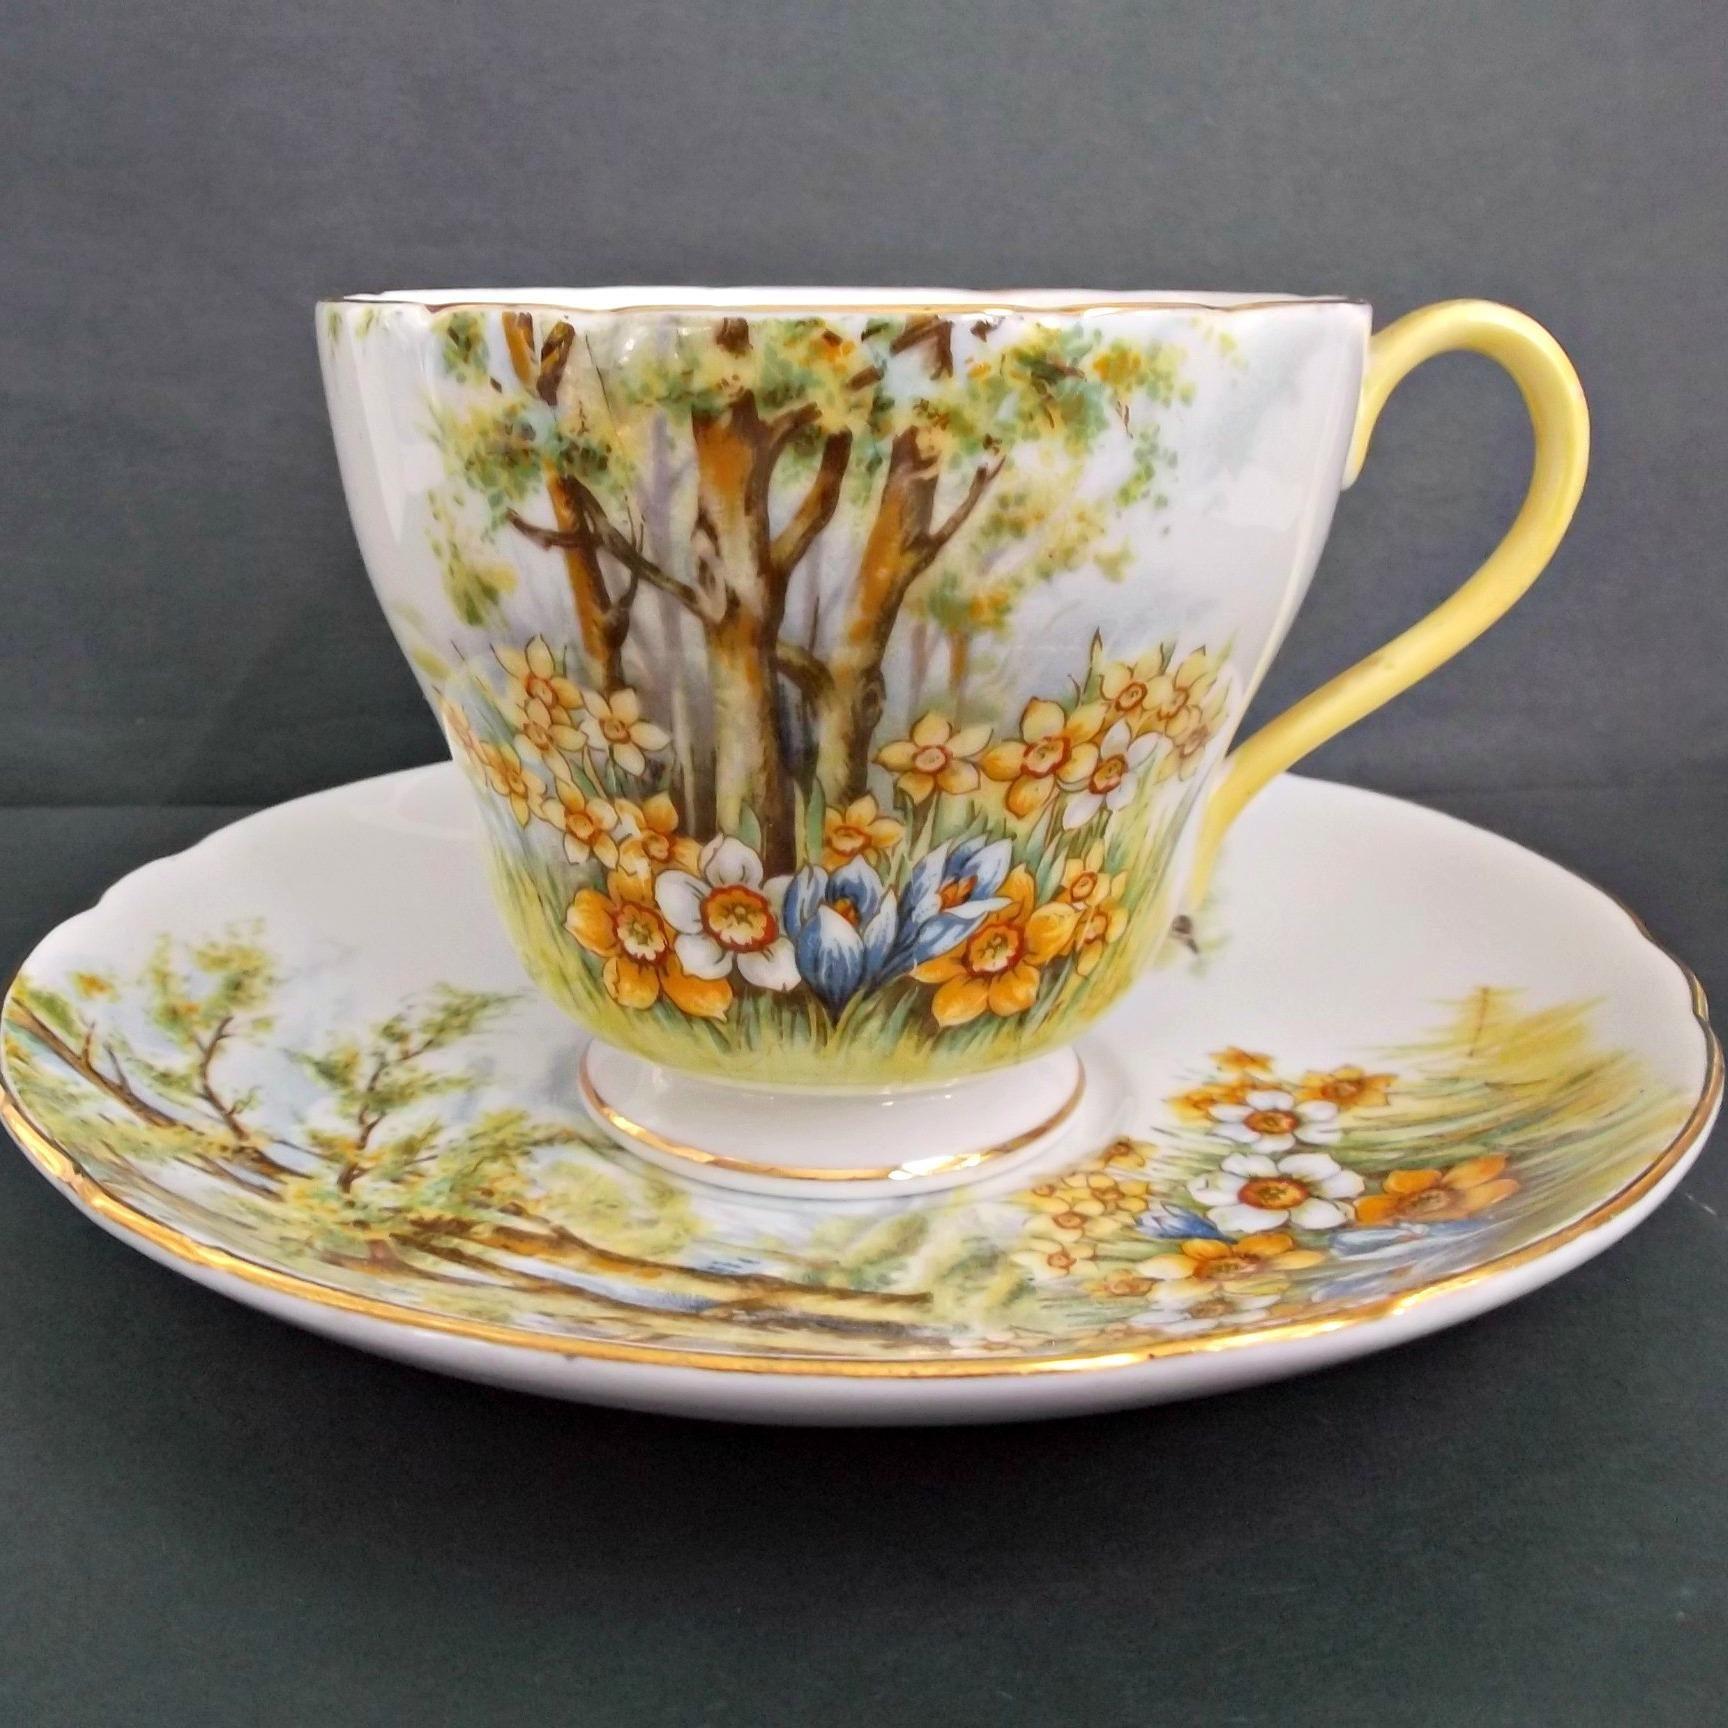 Here is a pretty vintage Shelley, England, fine bone china